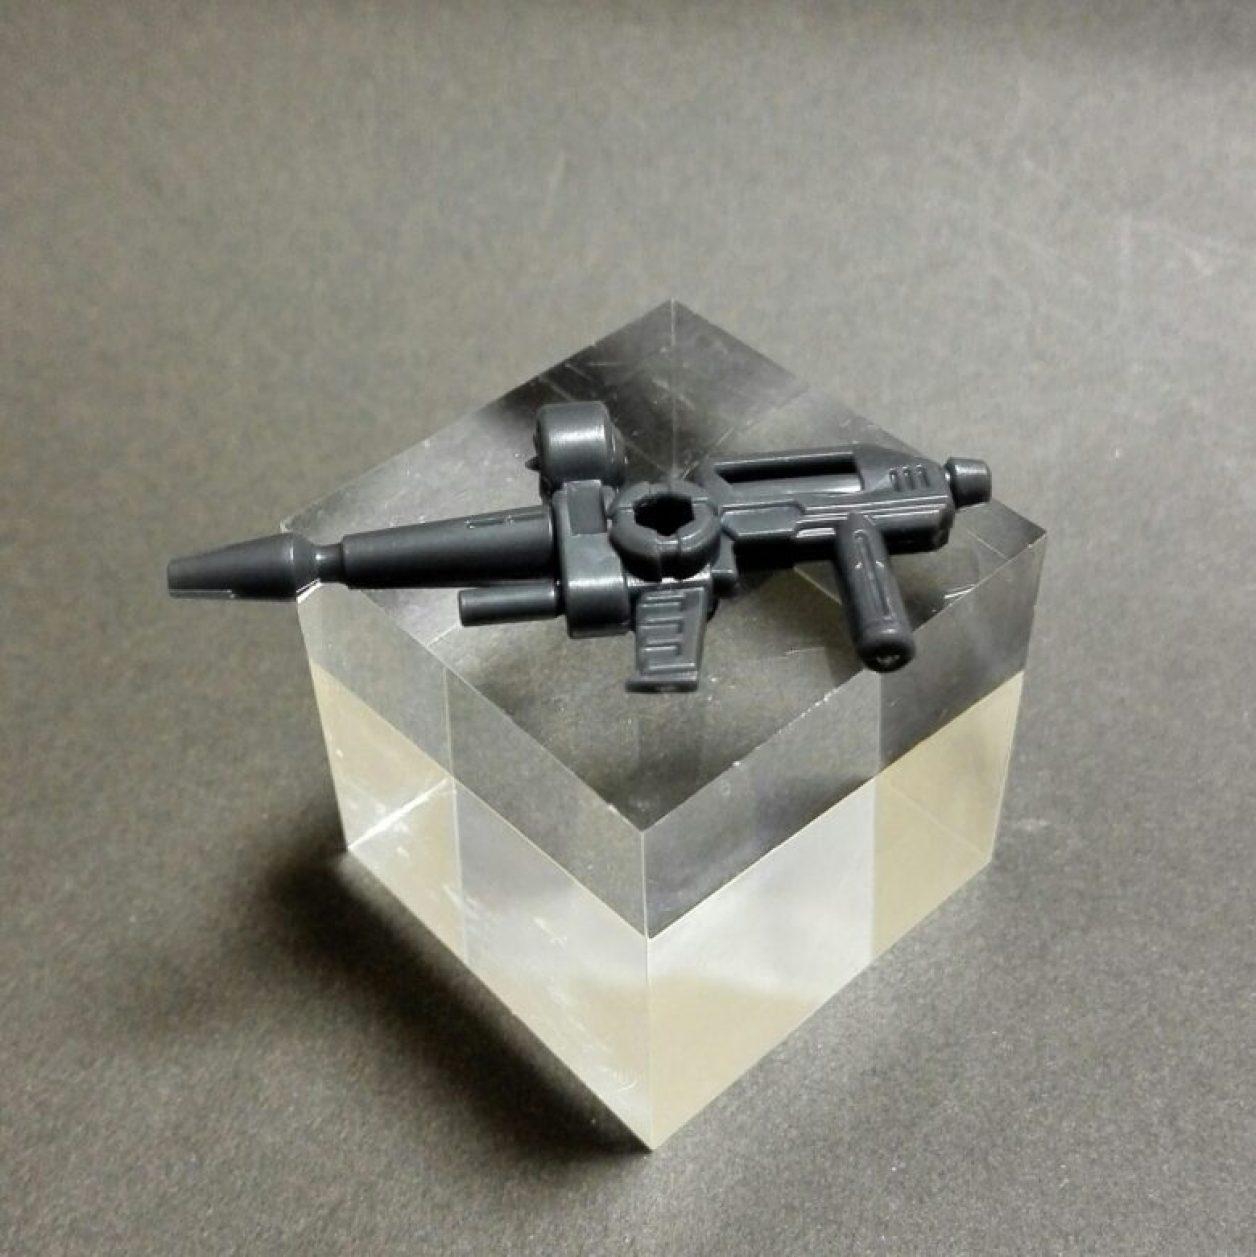 MOBILE SUIT ENSEMBLE(モビルスーツアンサンブル)1.5弾のガンダム(G3)の初期武装であるビーム・ライフルの画像